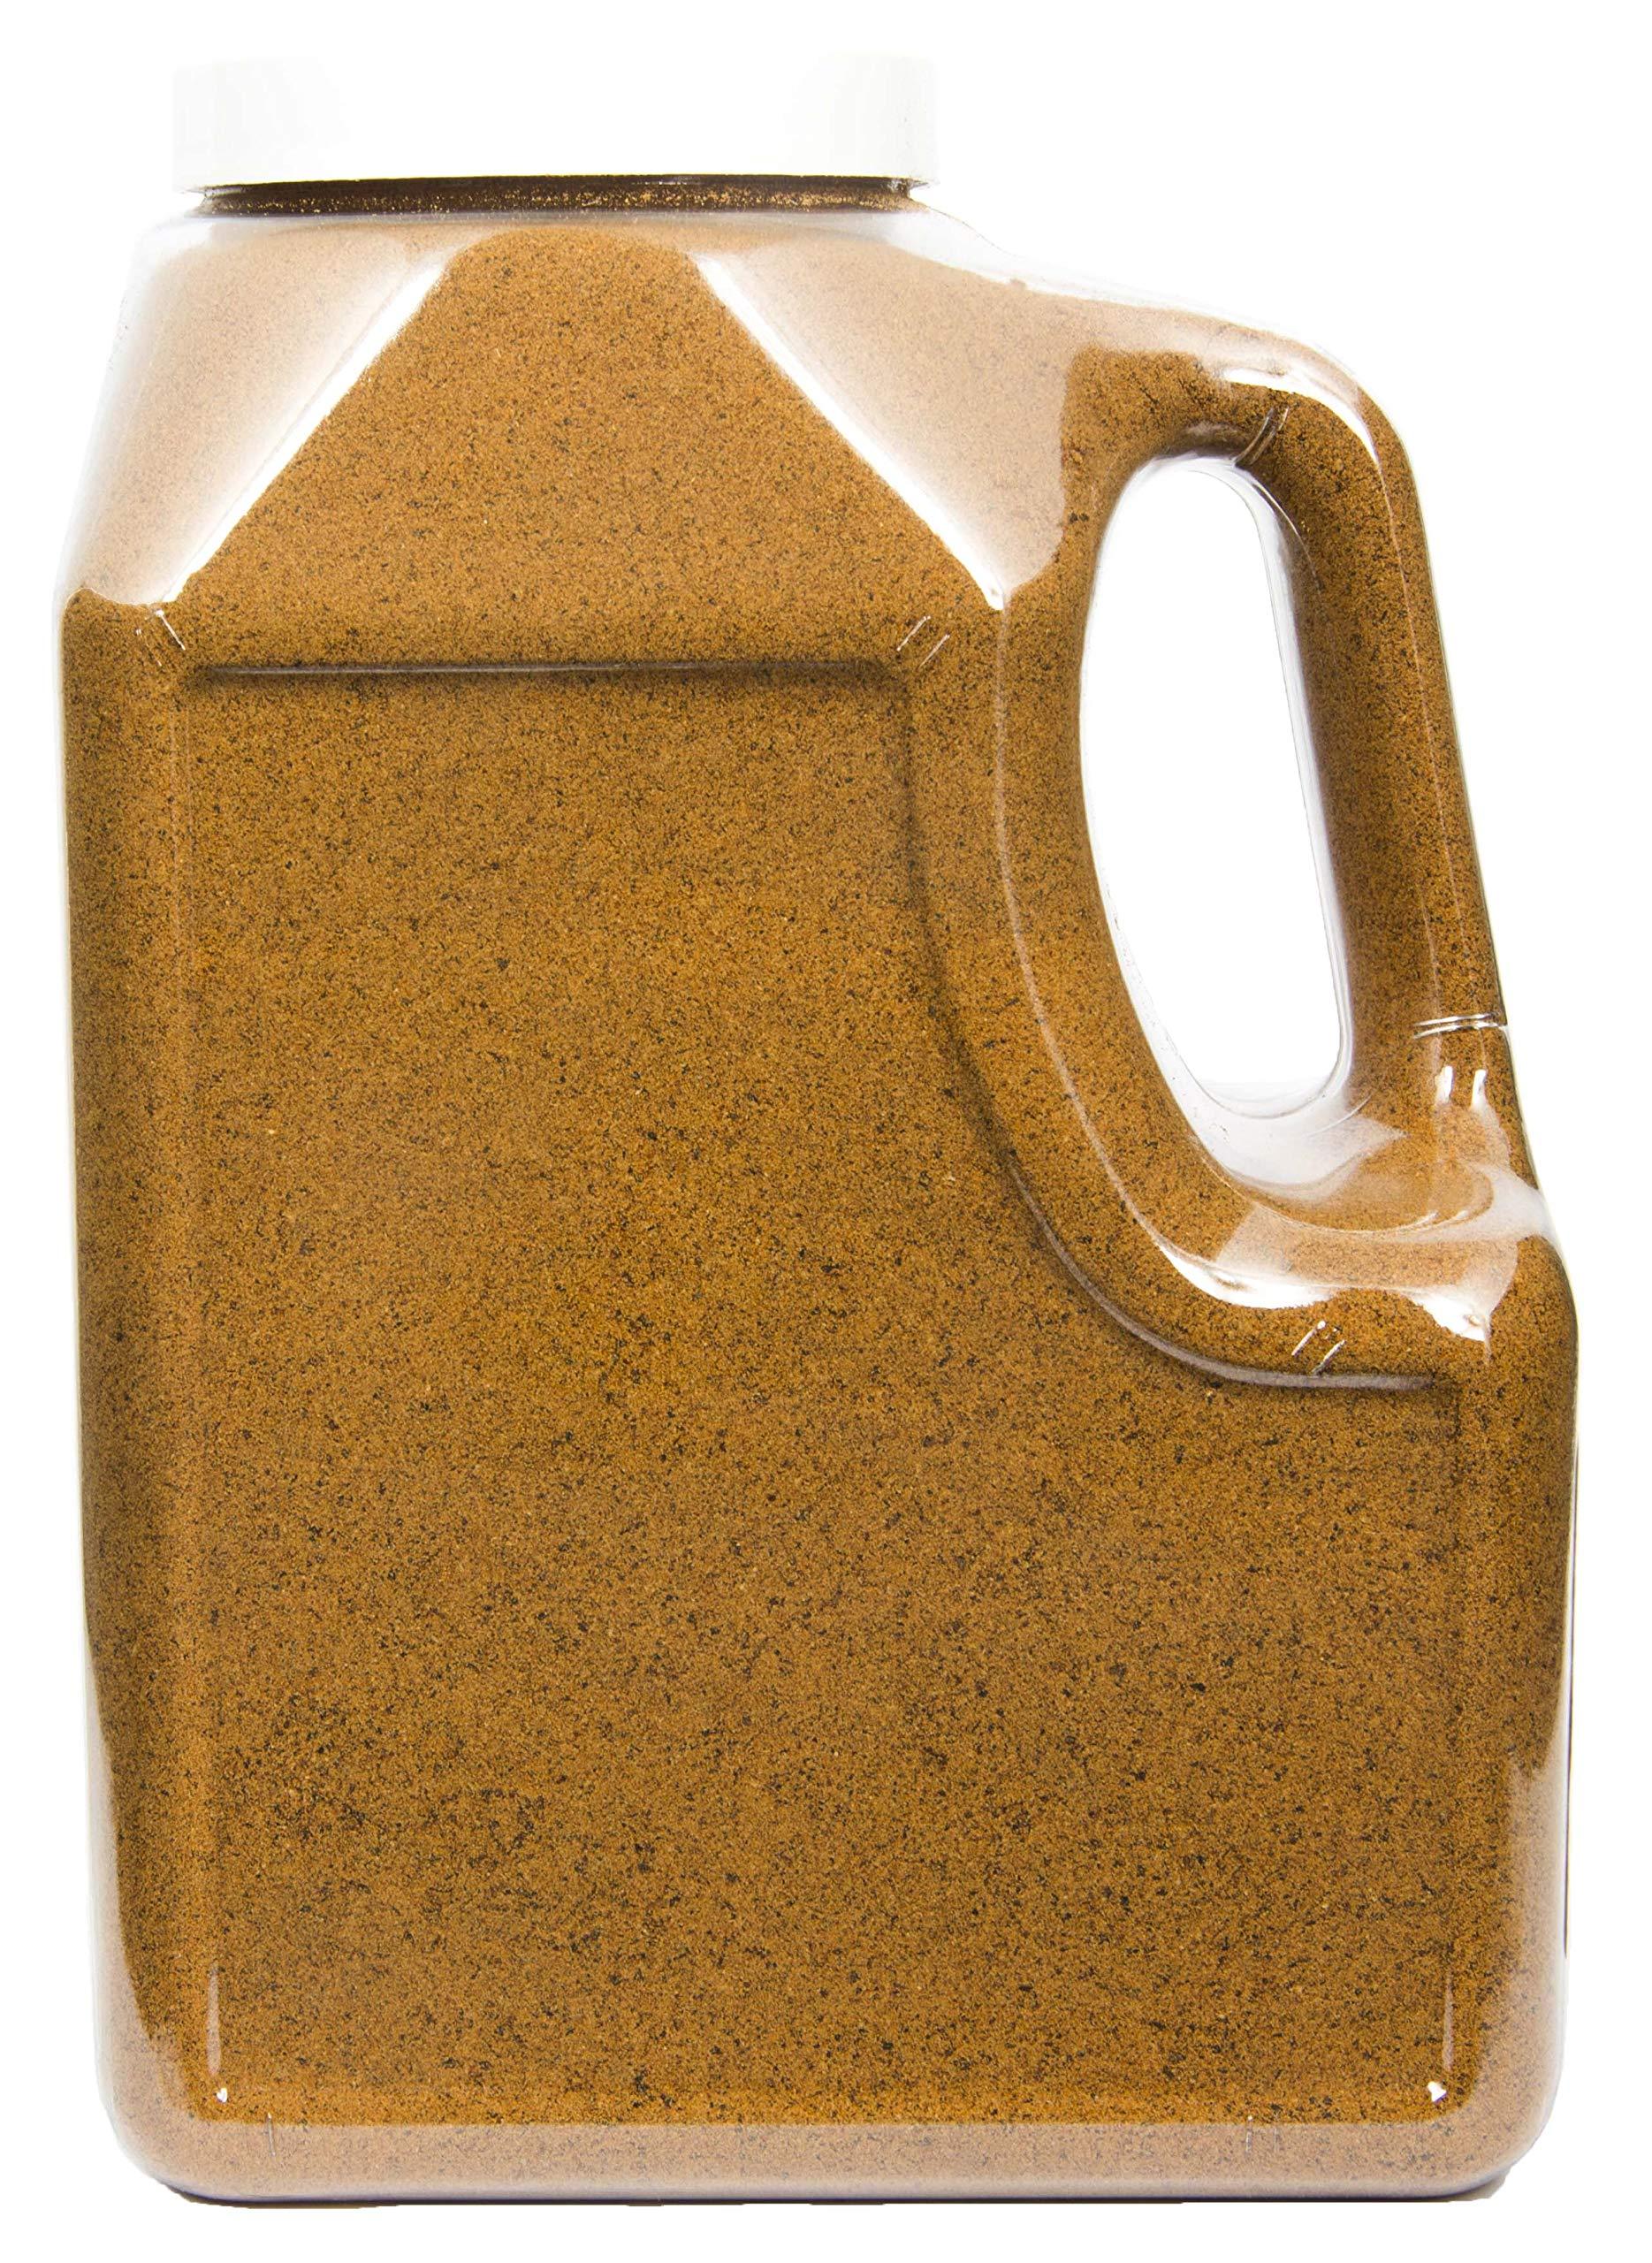 Ground Nutmeg : Pure Spice Blend Seasoning, No Additives, Holiday Spice : Kosher (40oz.) by Burma Spice (Image #1)